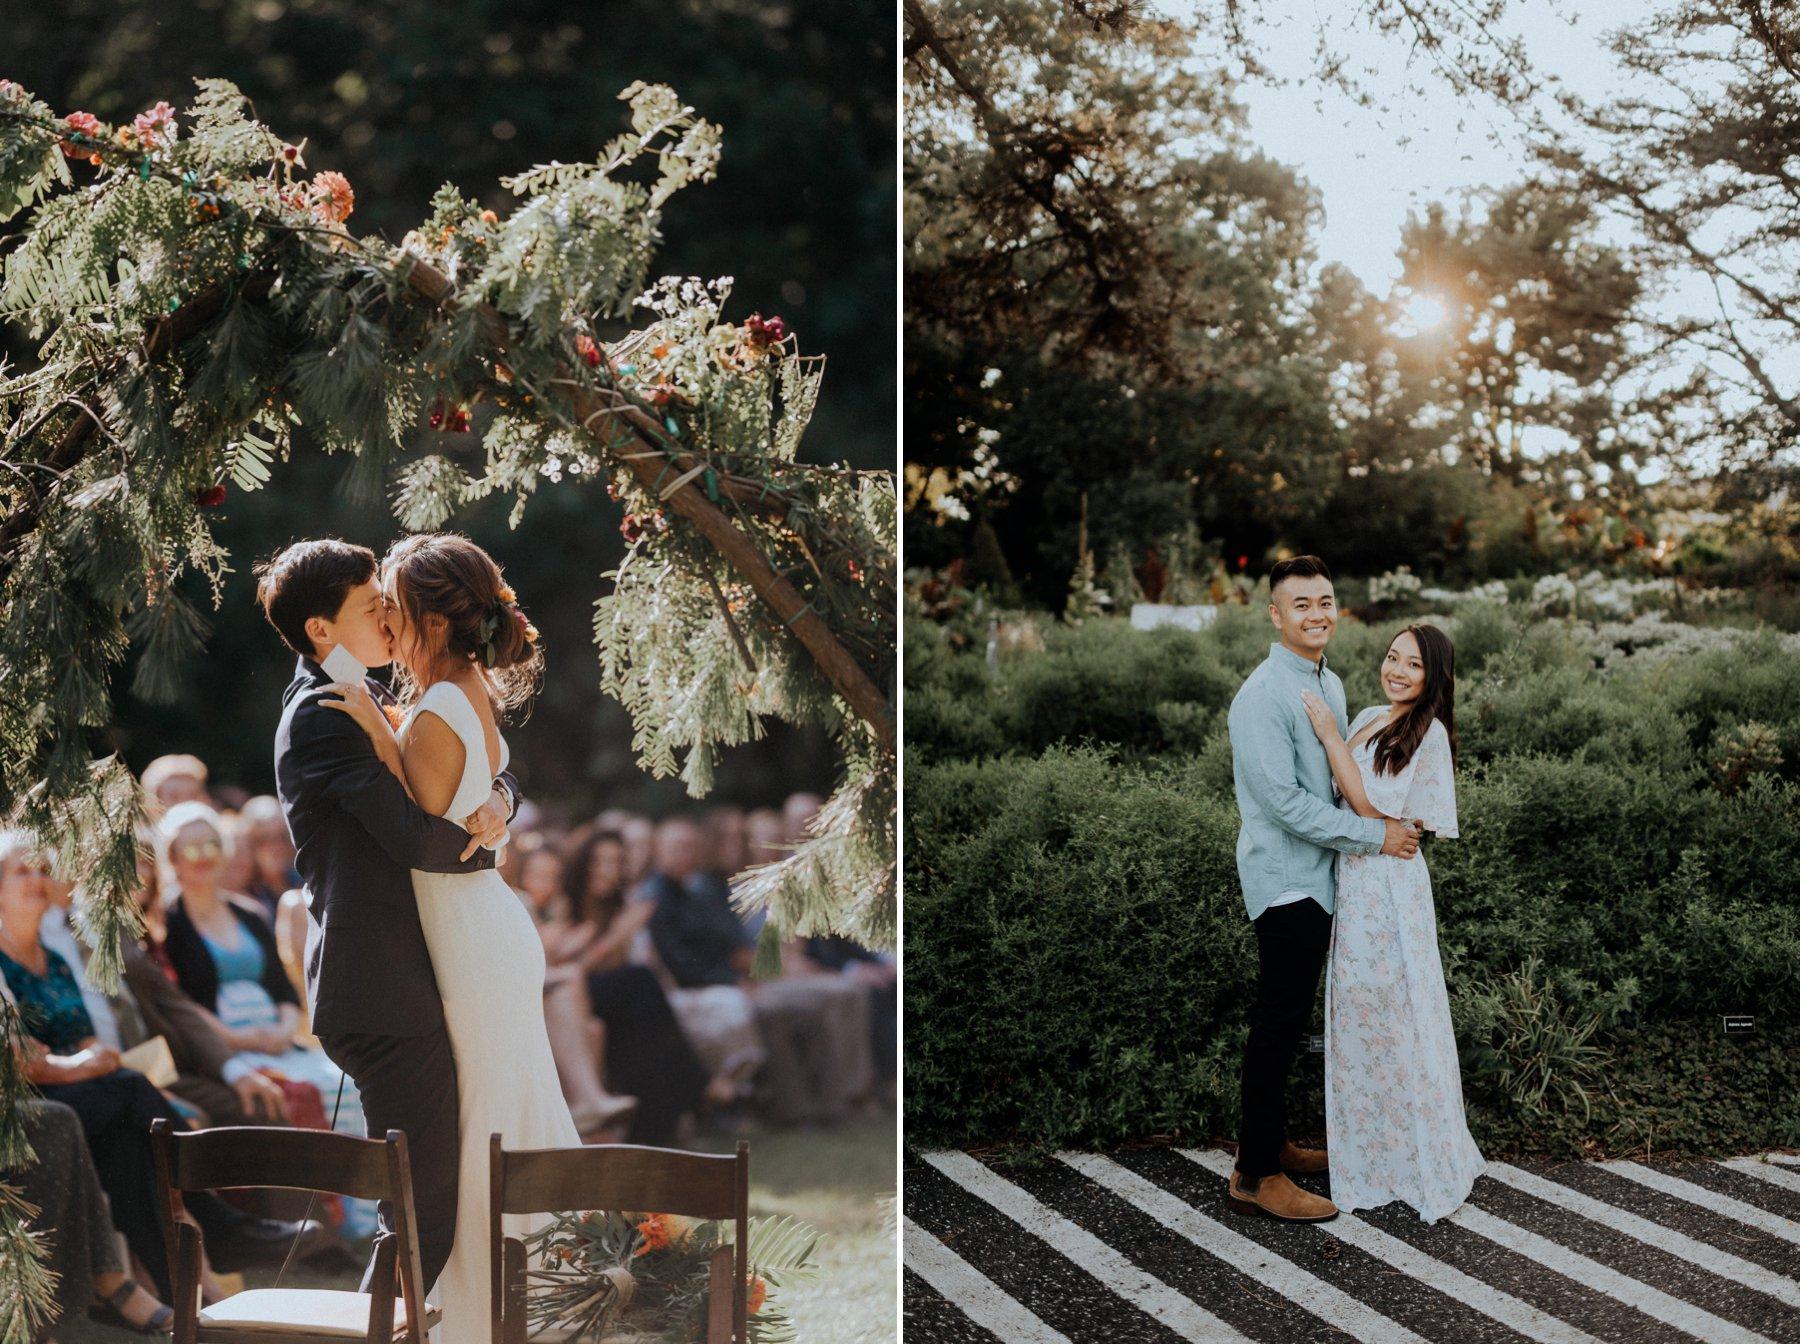 047-021-private-estate-wedding-11.jpg